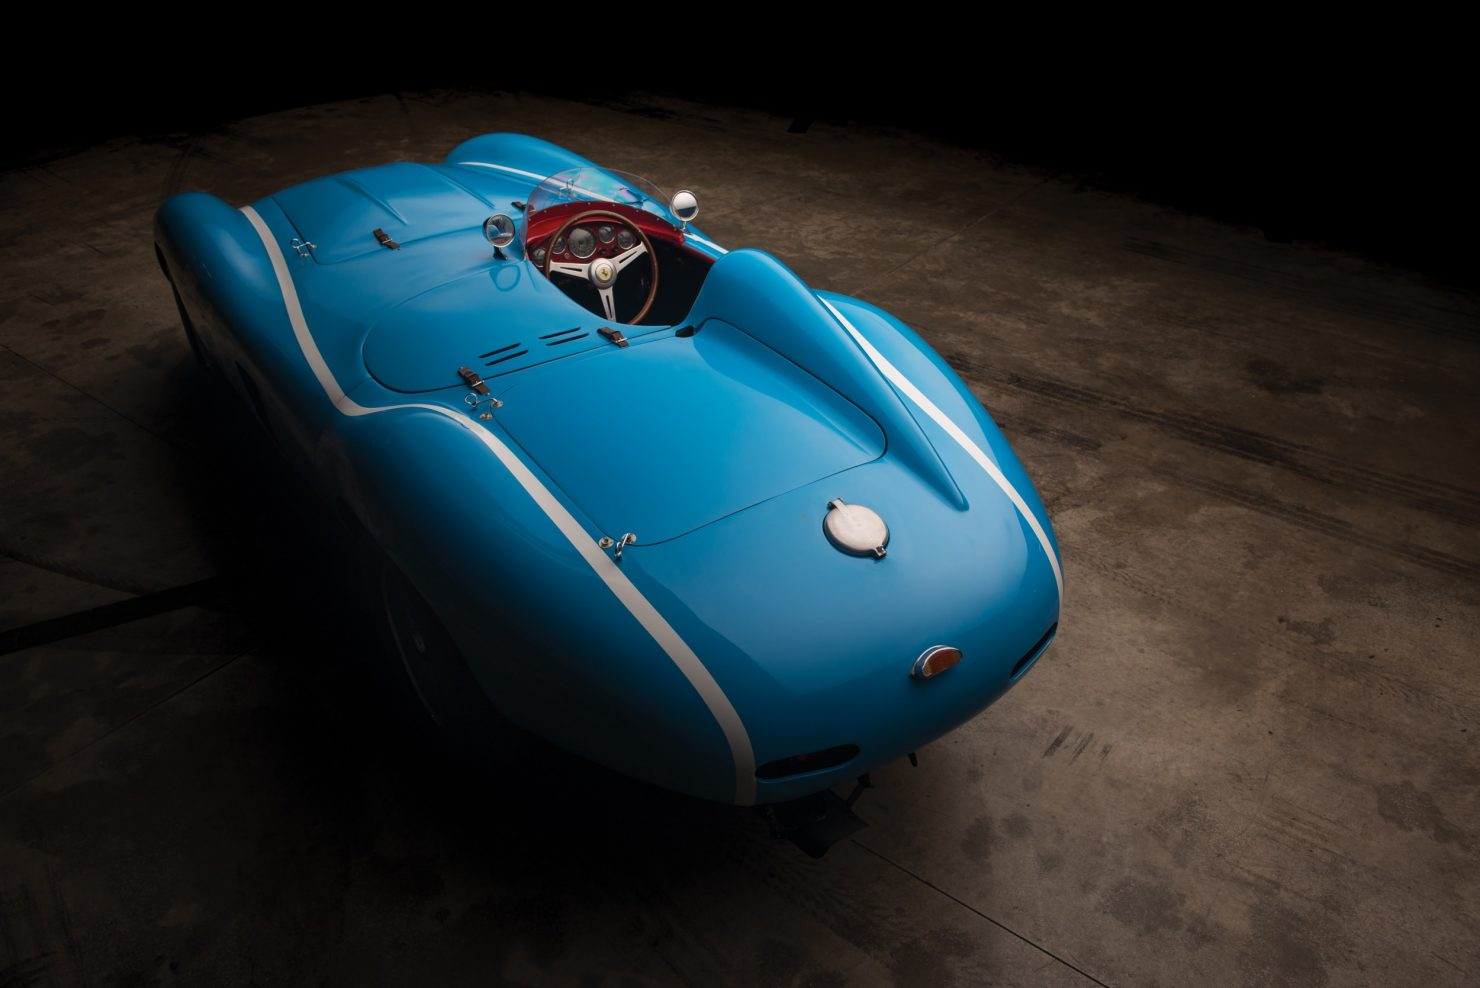 ferrari 121 lm spider 2 1480x988 - 1955 Ferrari 121 LM